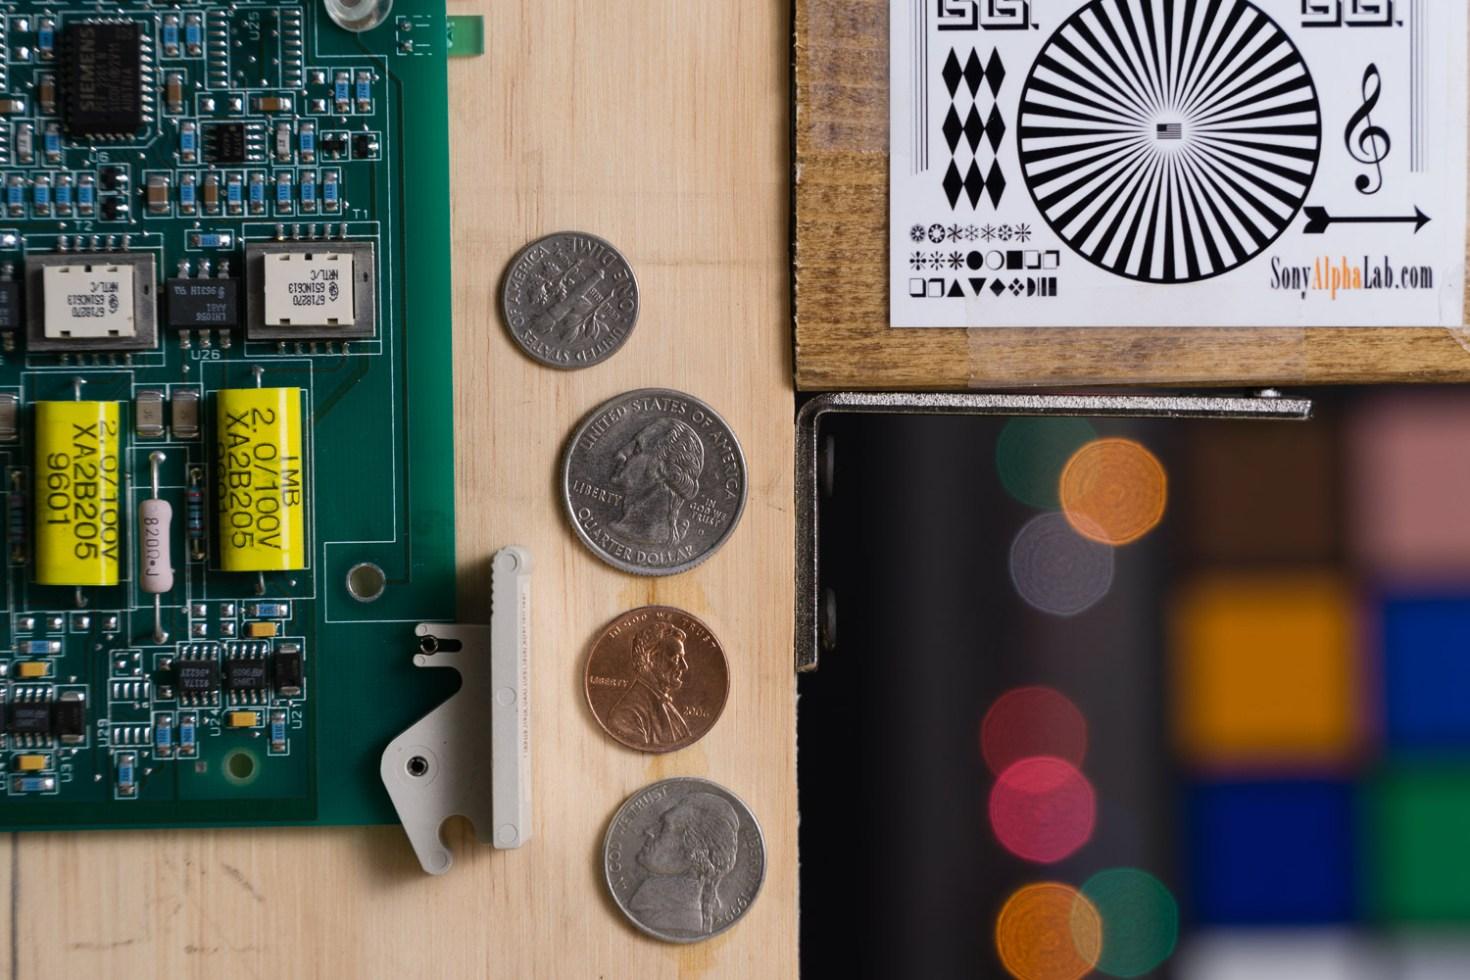 Sony A6000 w/ 18-105mm f/4 OSS G Lens @ 105mm, f/5.6